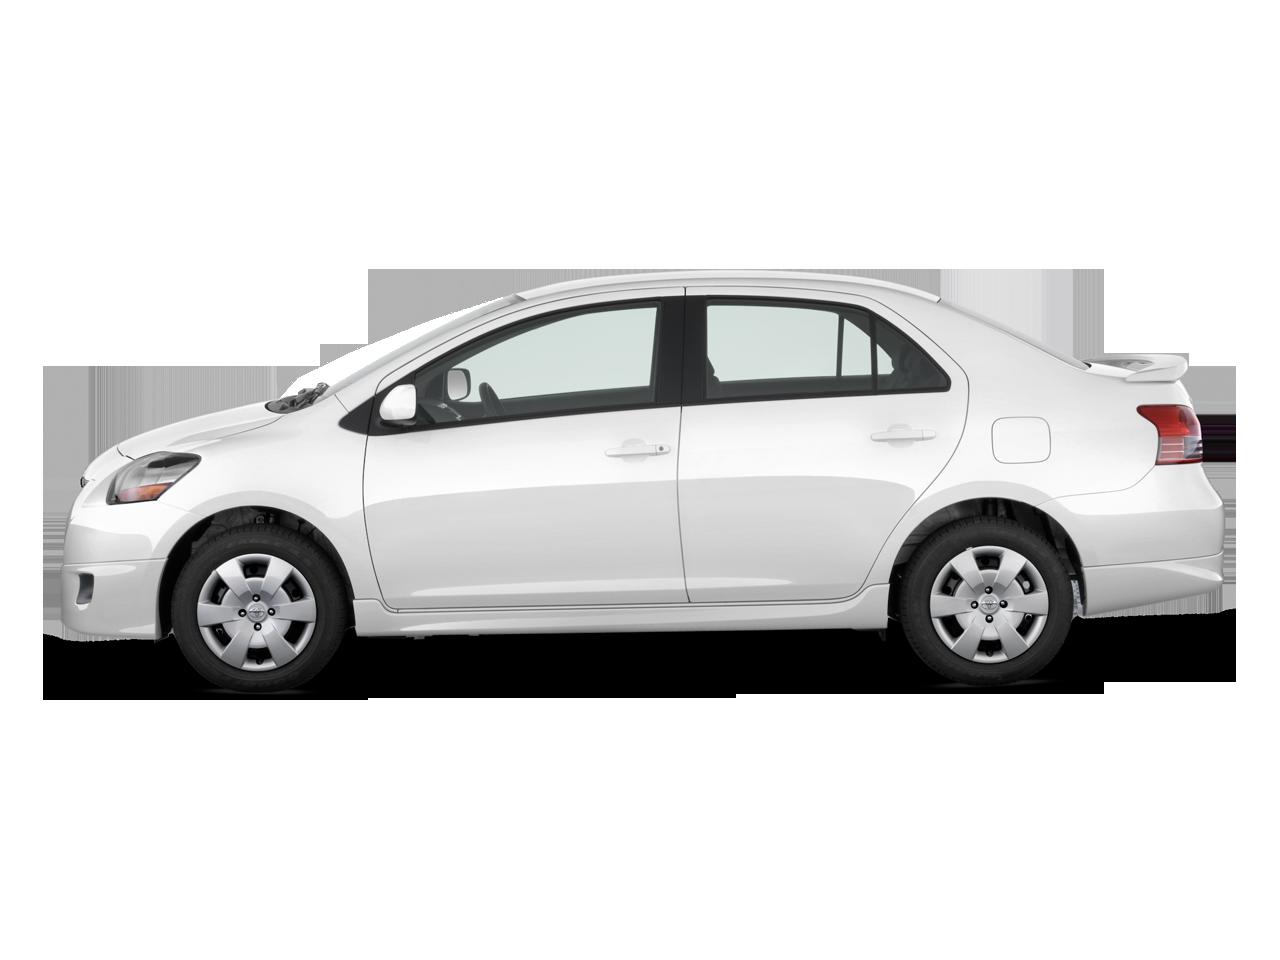 Toyota Yaris II 2005 - 2009 Sedan #3